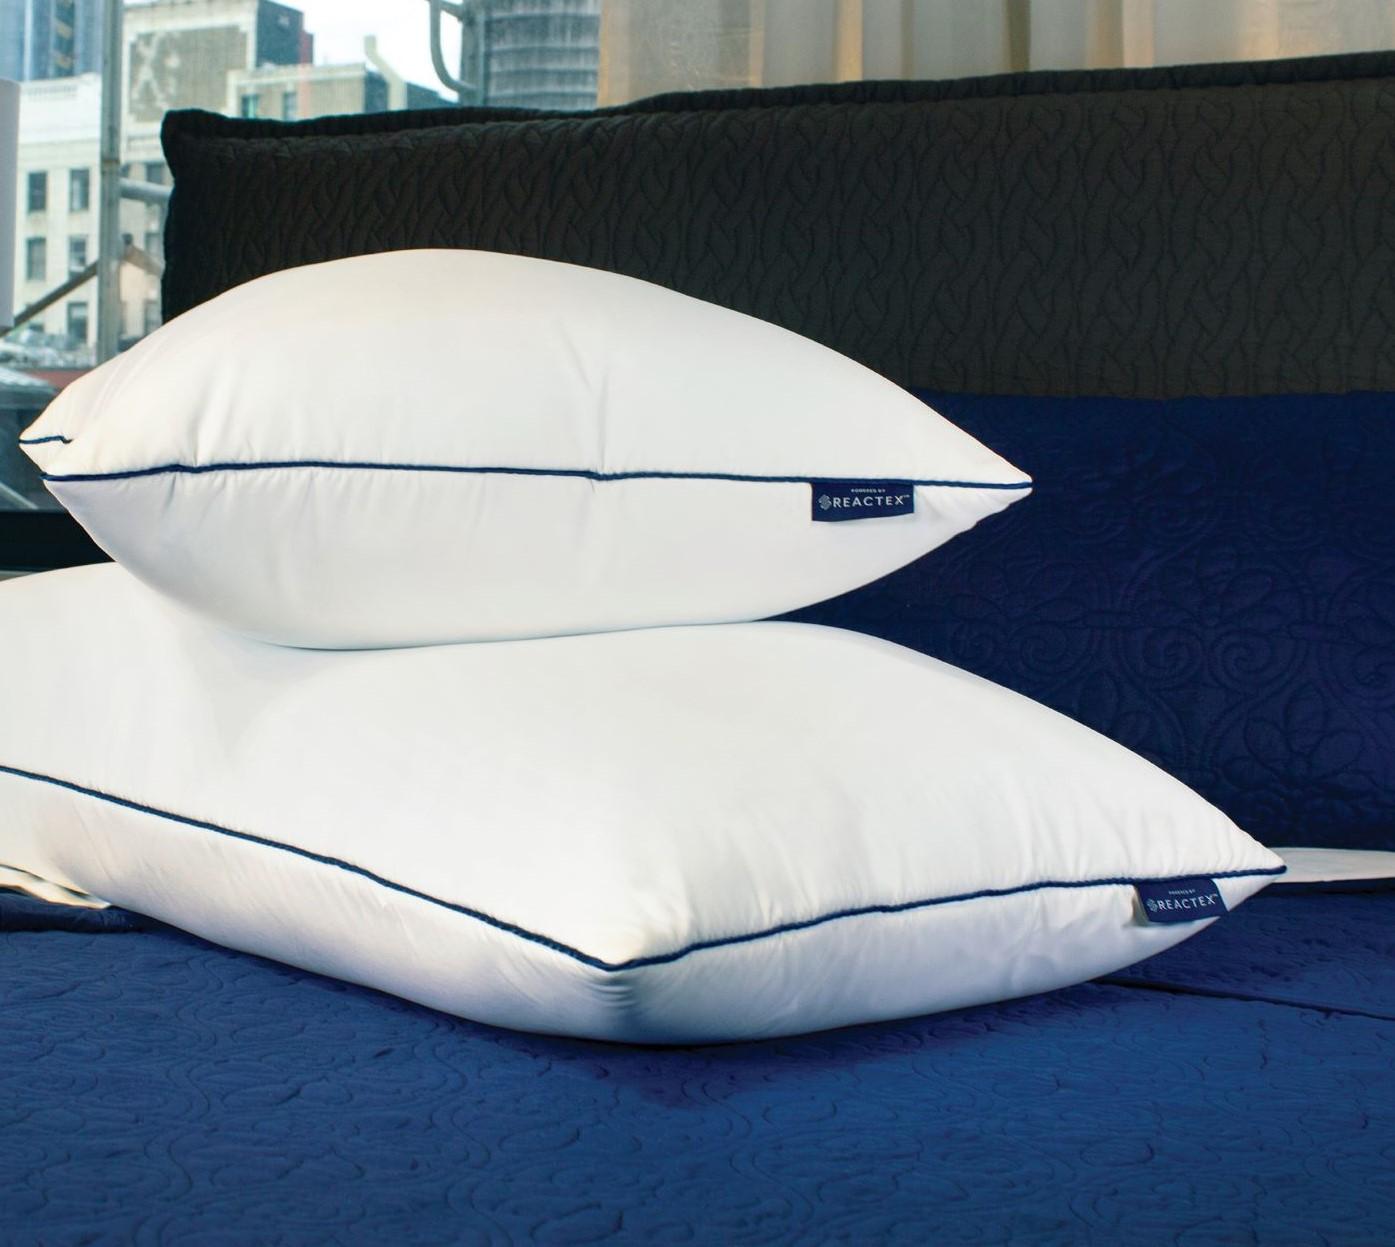 Therapedic® Polar Nights™ 25x Cooling Adjustable Ice Cube Hybrid Pillow